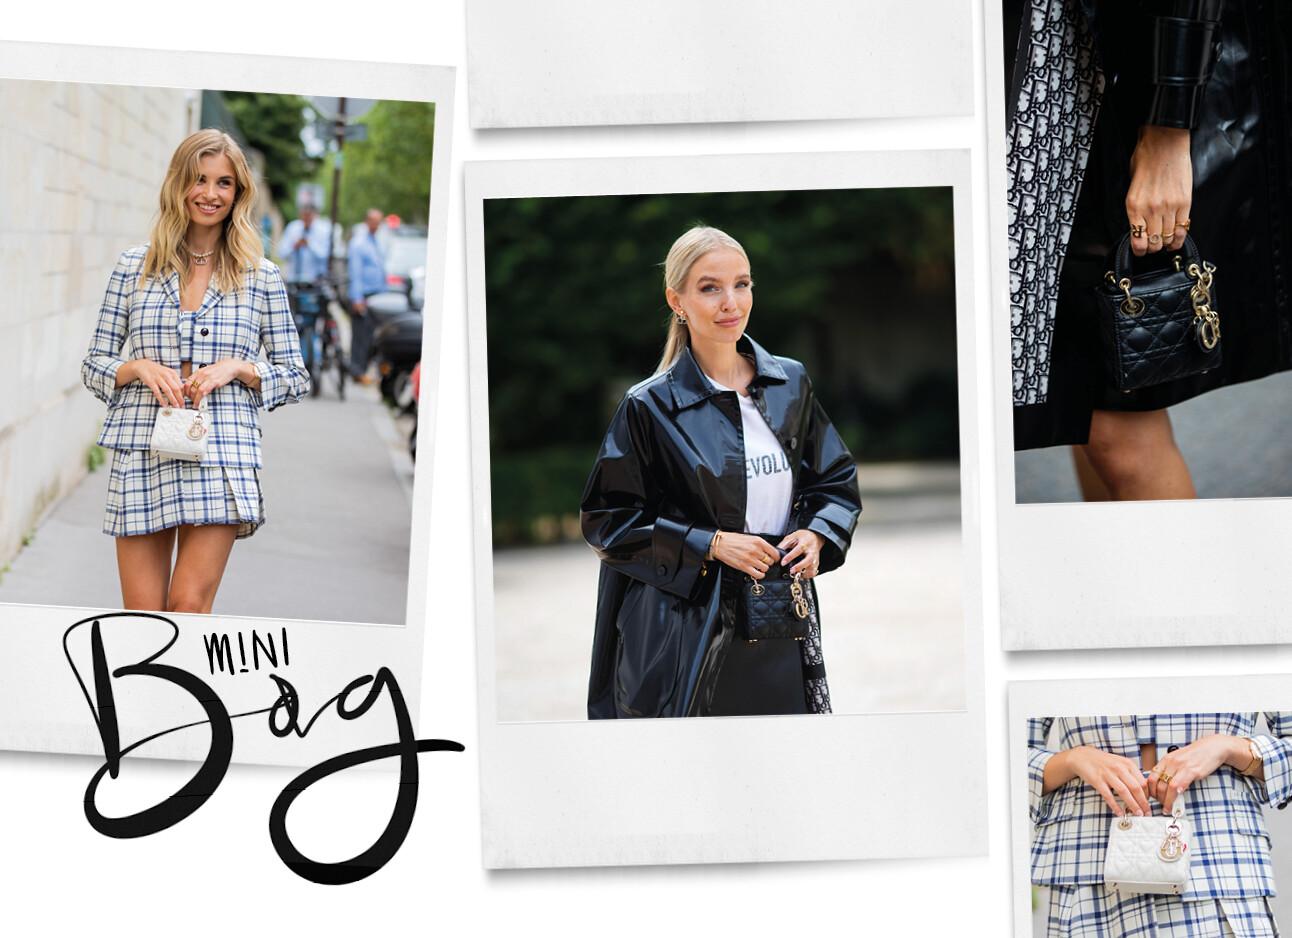 Dit is dé #1 hit-bag van Dior tijdens Couture Fashion Week